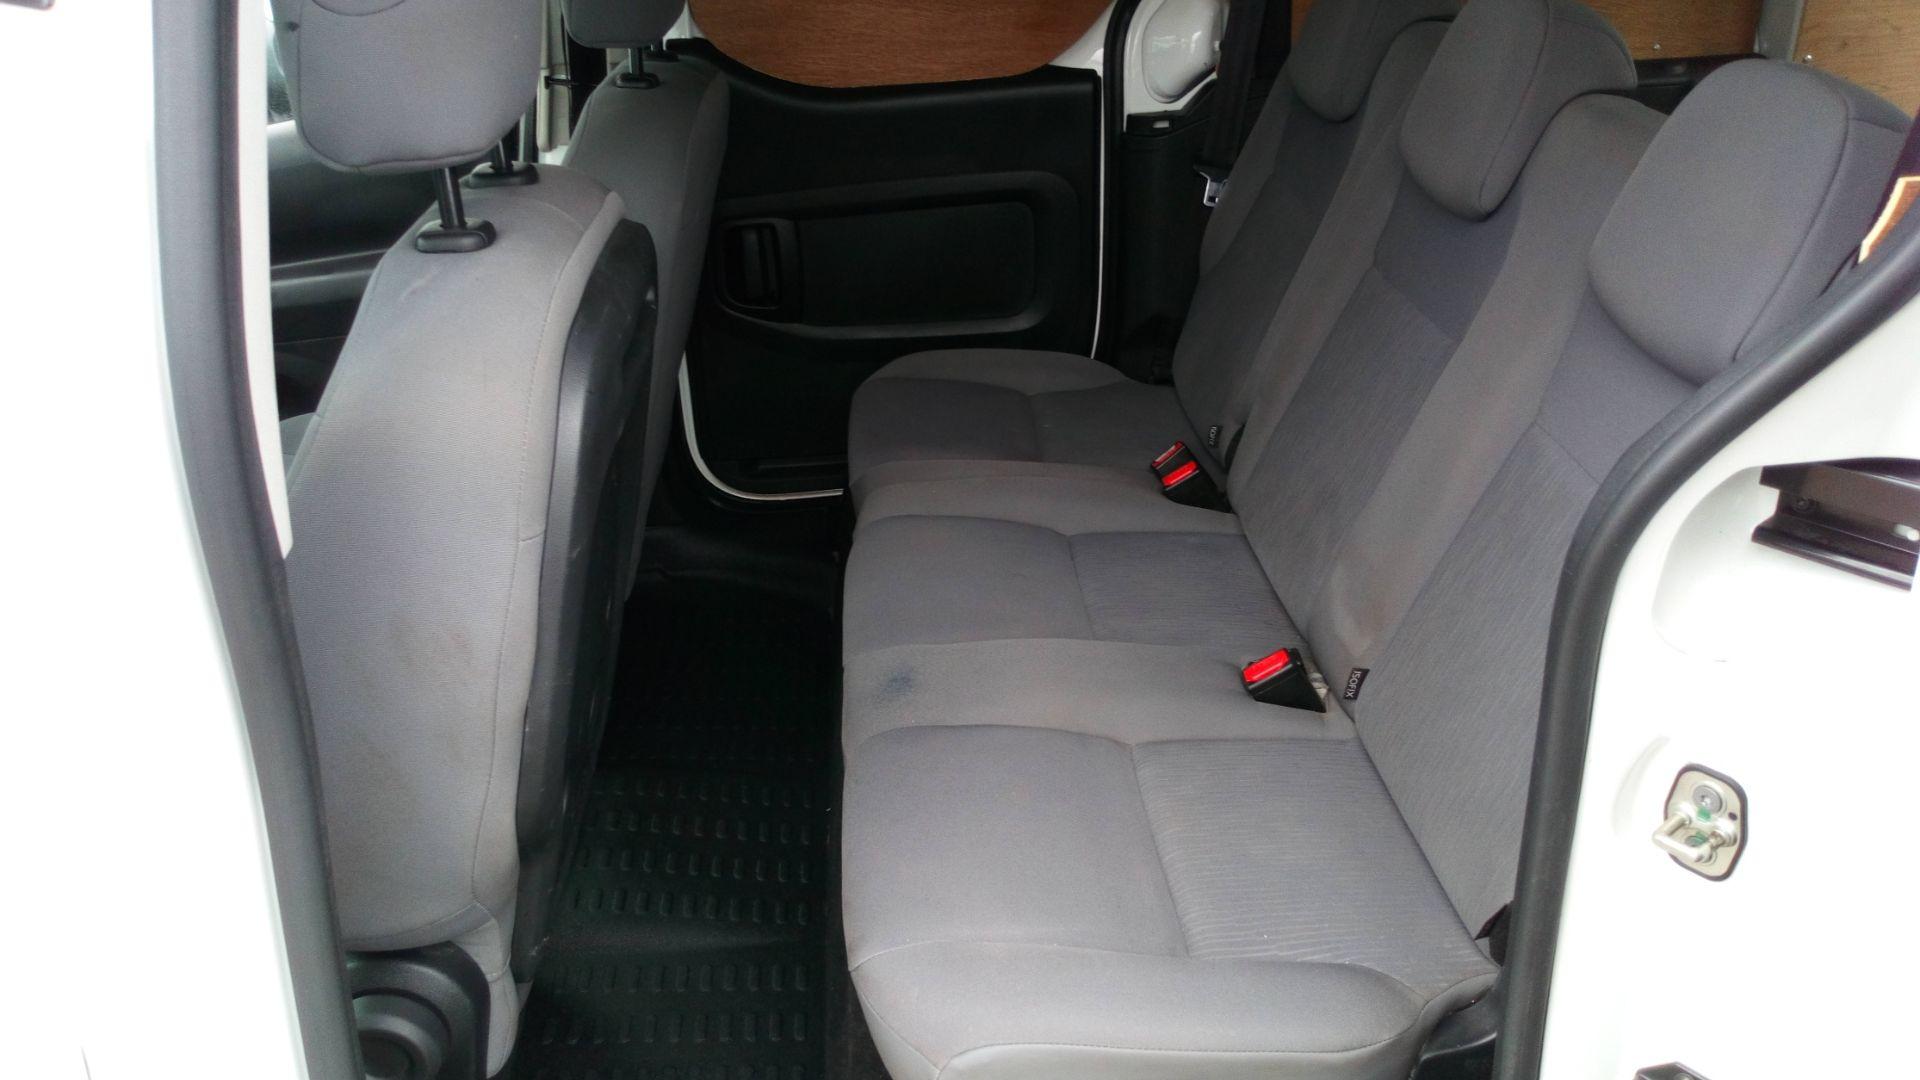 2016 Peugeot Partner 715 S 1.6 Hdi 92 Crew Van (NY16EKP) Image 19